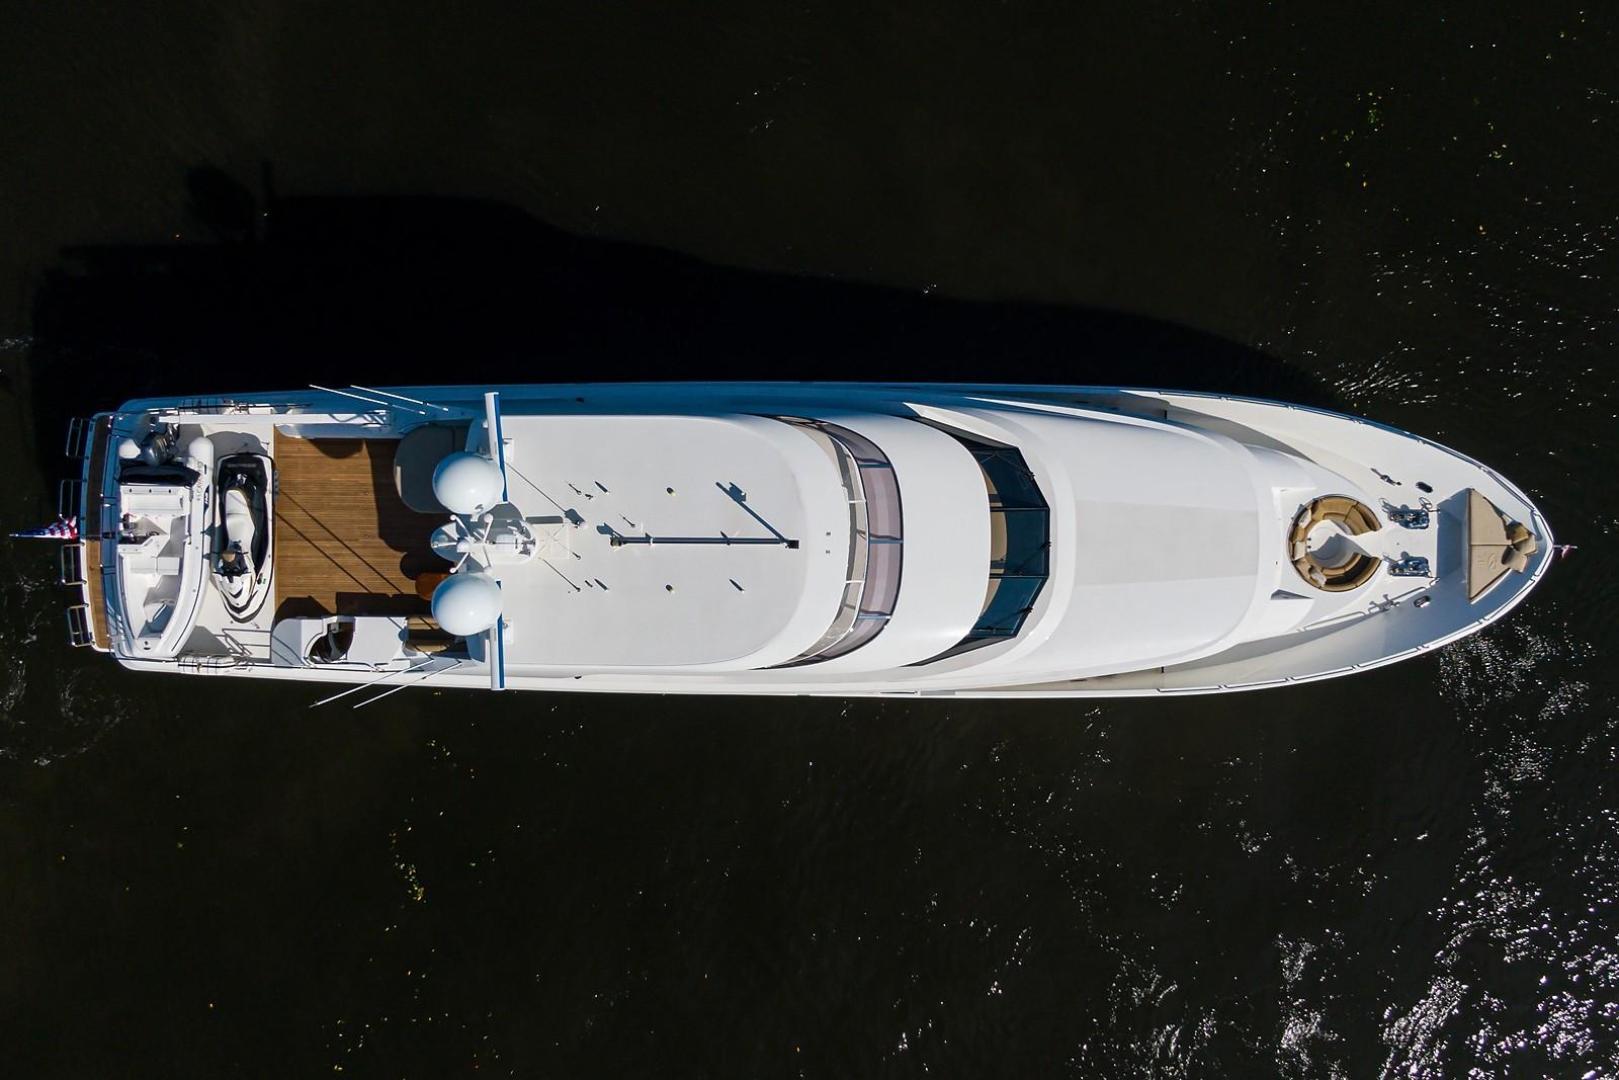 Westport-Motoryacht 2010-Cavallino Fort Lauderdale-Florida-United States-Arial View-1270076 | Thumbnail